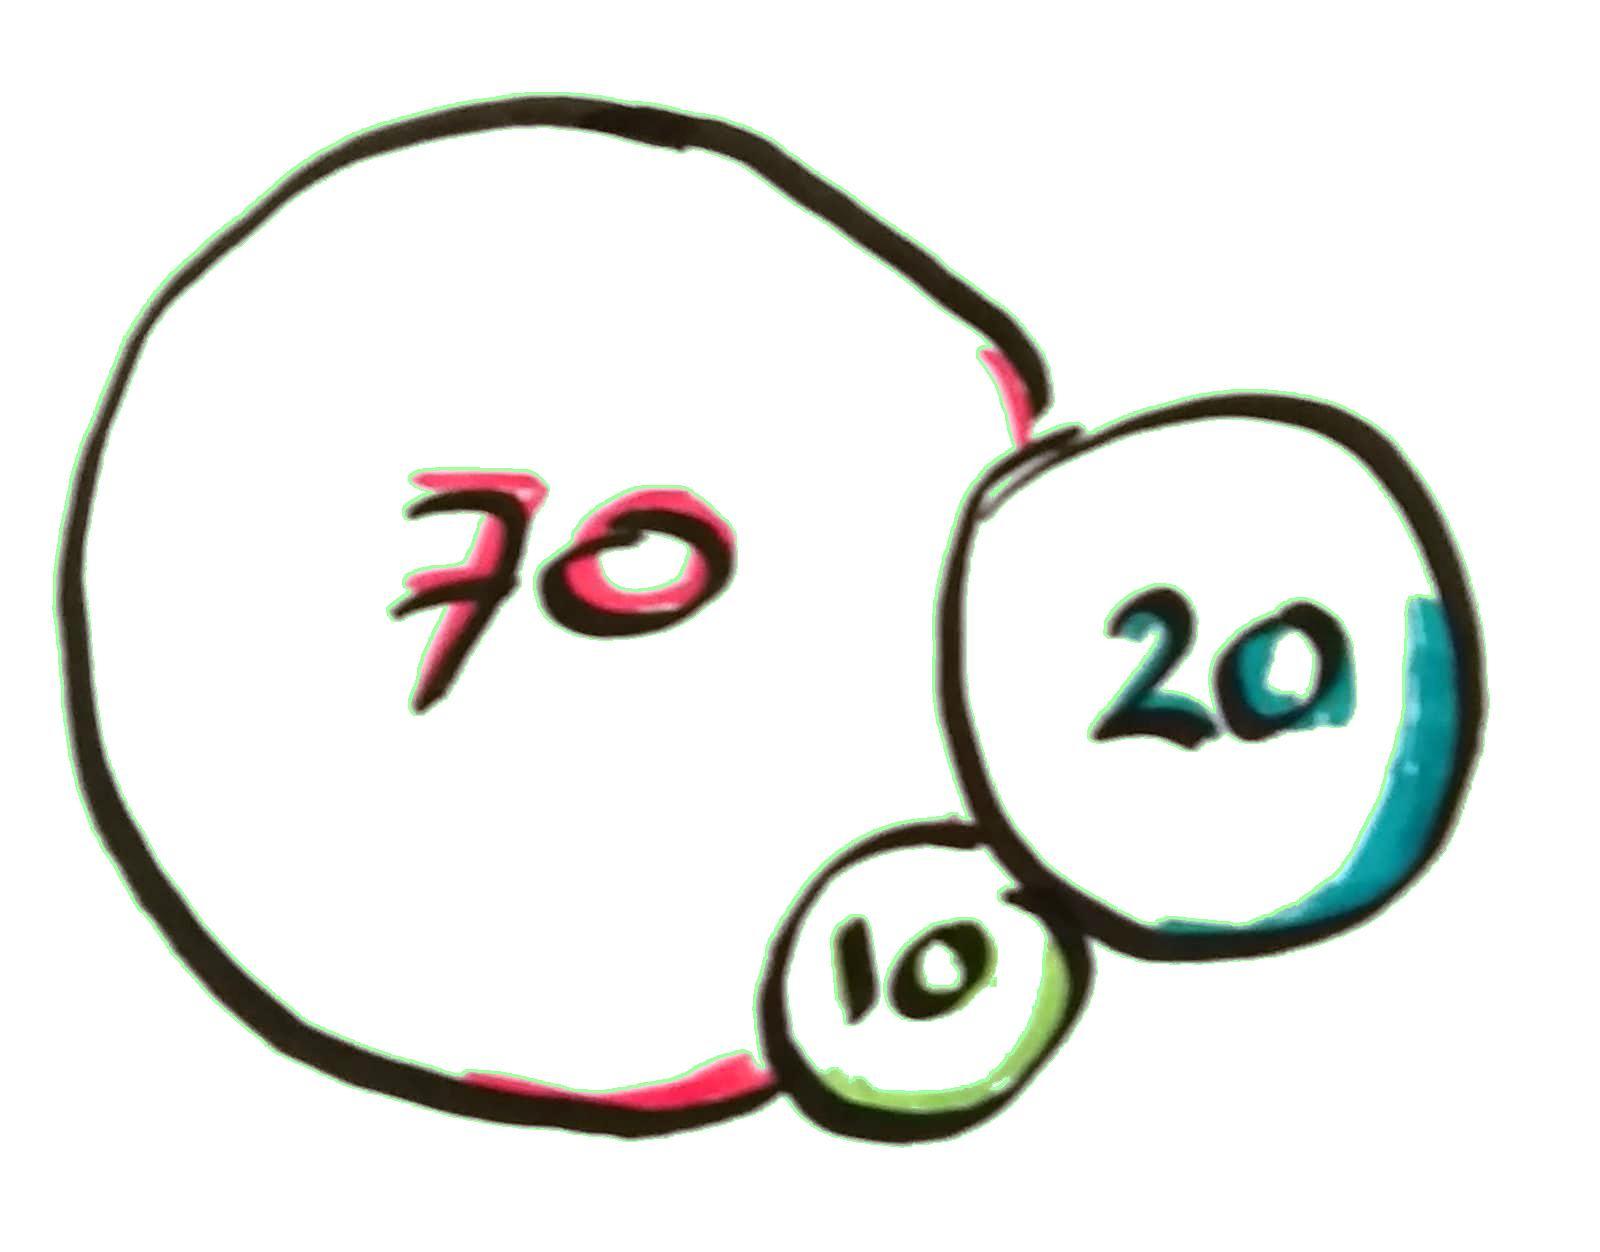 70-20-10